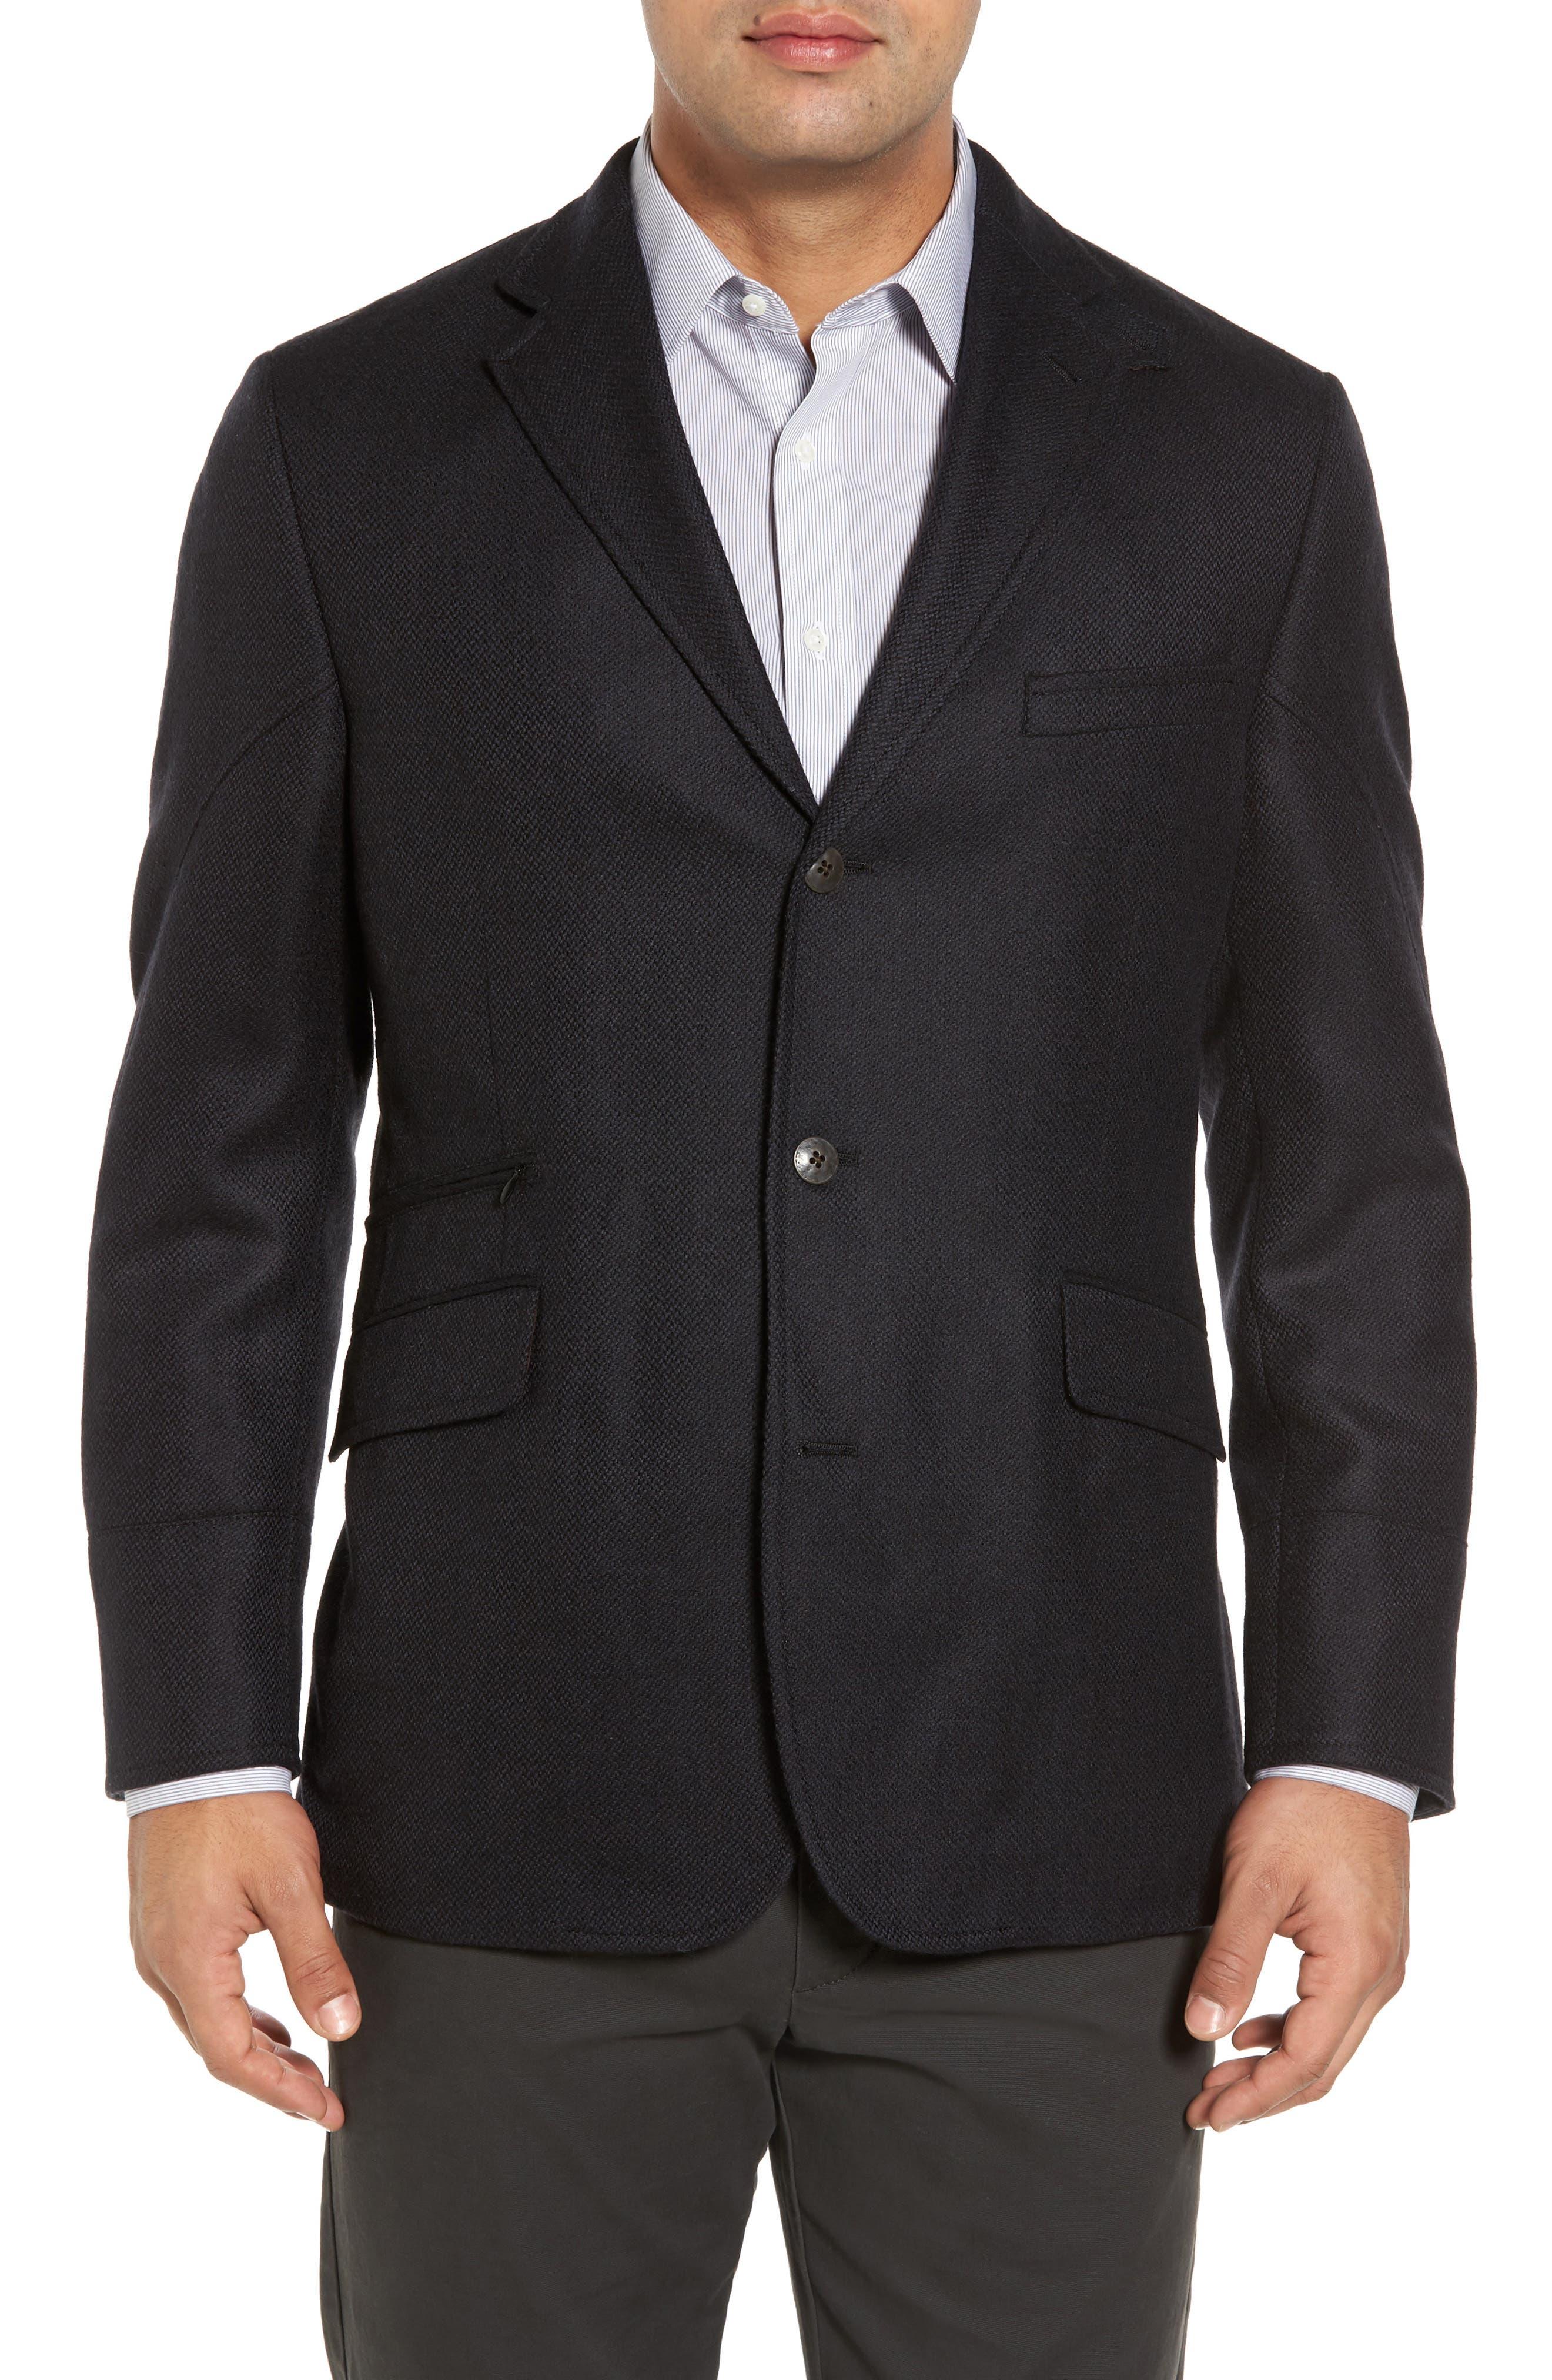 Ritchie Aim Hybrid Classic Fit Wool & Cashmere Sport Coat,                             Alternate thumbnail 4, color,                             Black